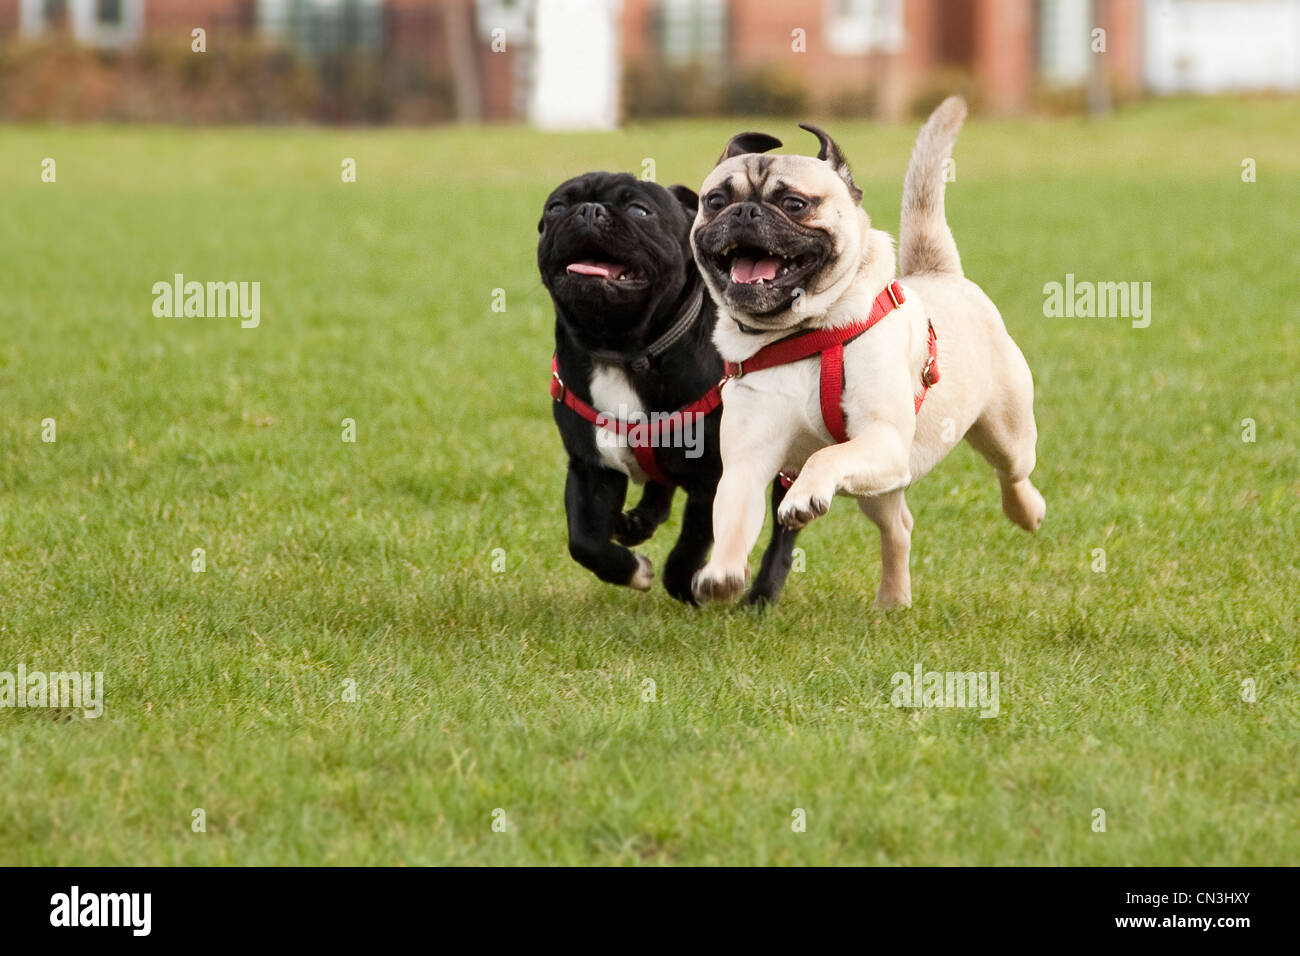 Pugs running - Stock Image